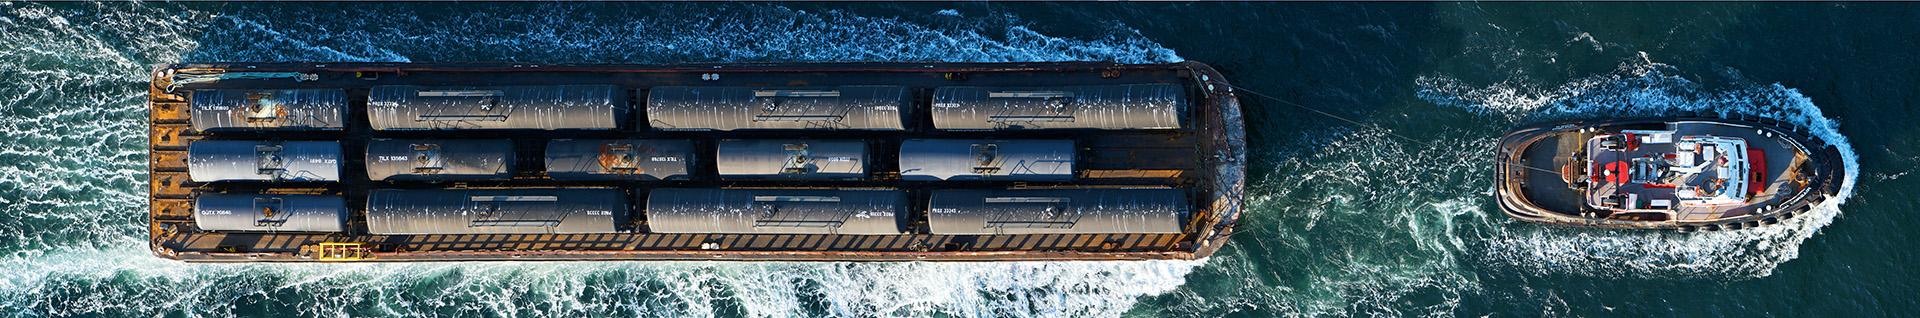 tug barge tanks Final copy